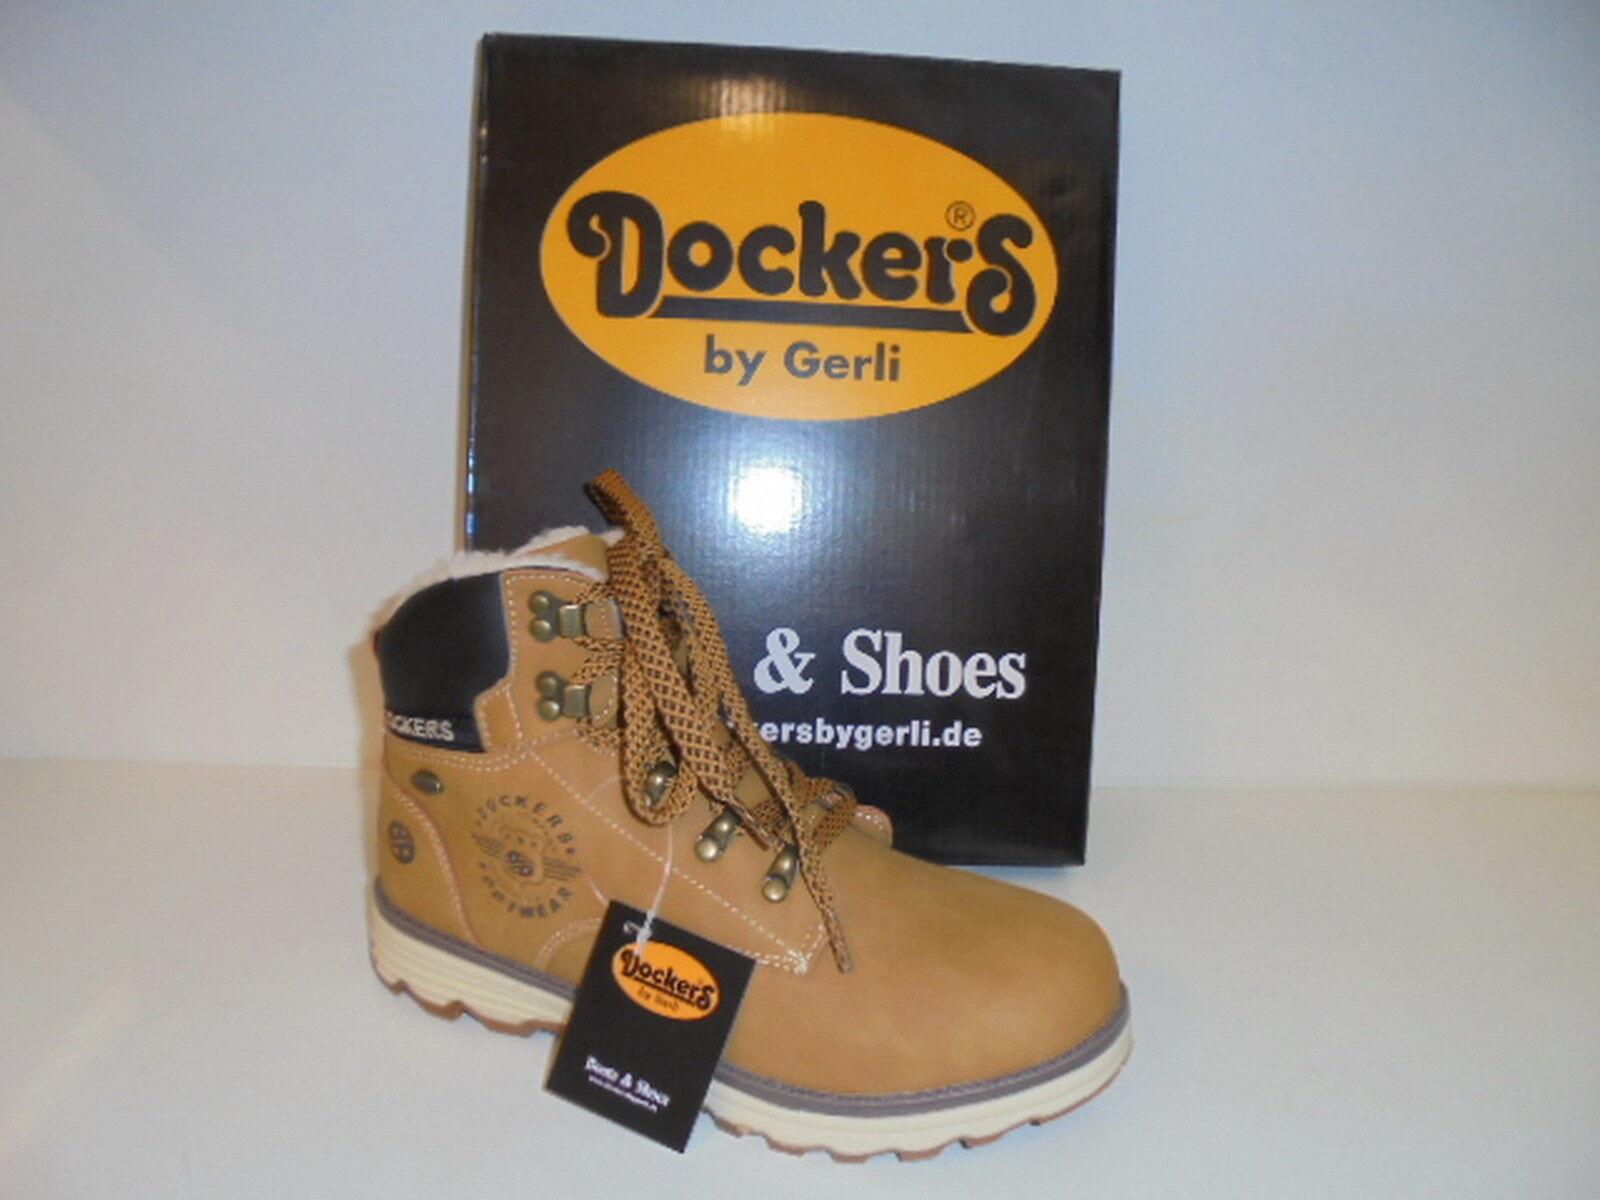 Neu Dockers Dockers Neu Damenschuhe gelb Stiefelette Stiefel 41TE720 gelb Damenschuhe a2029e